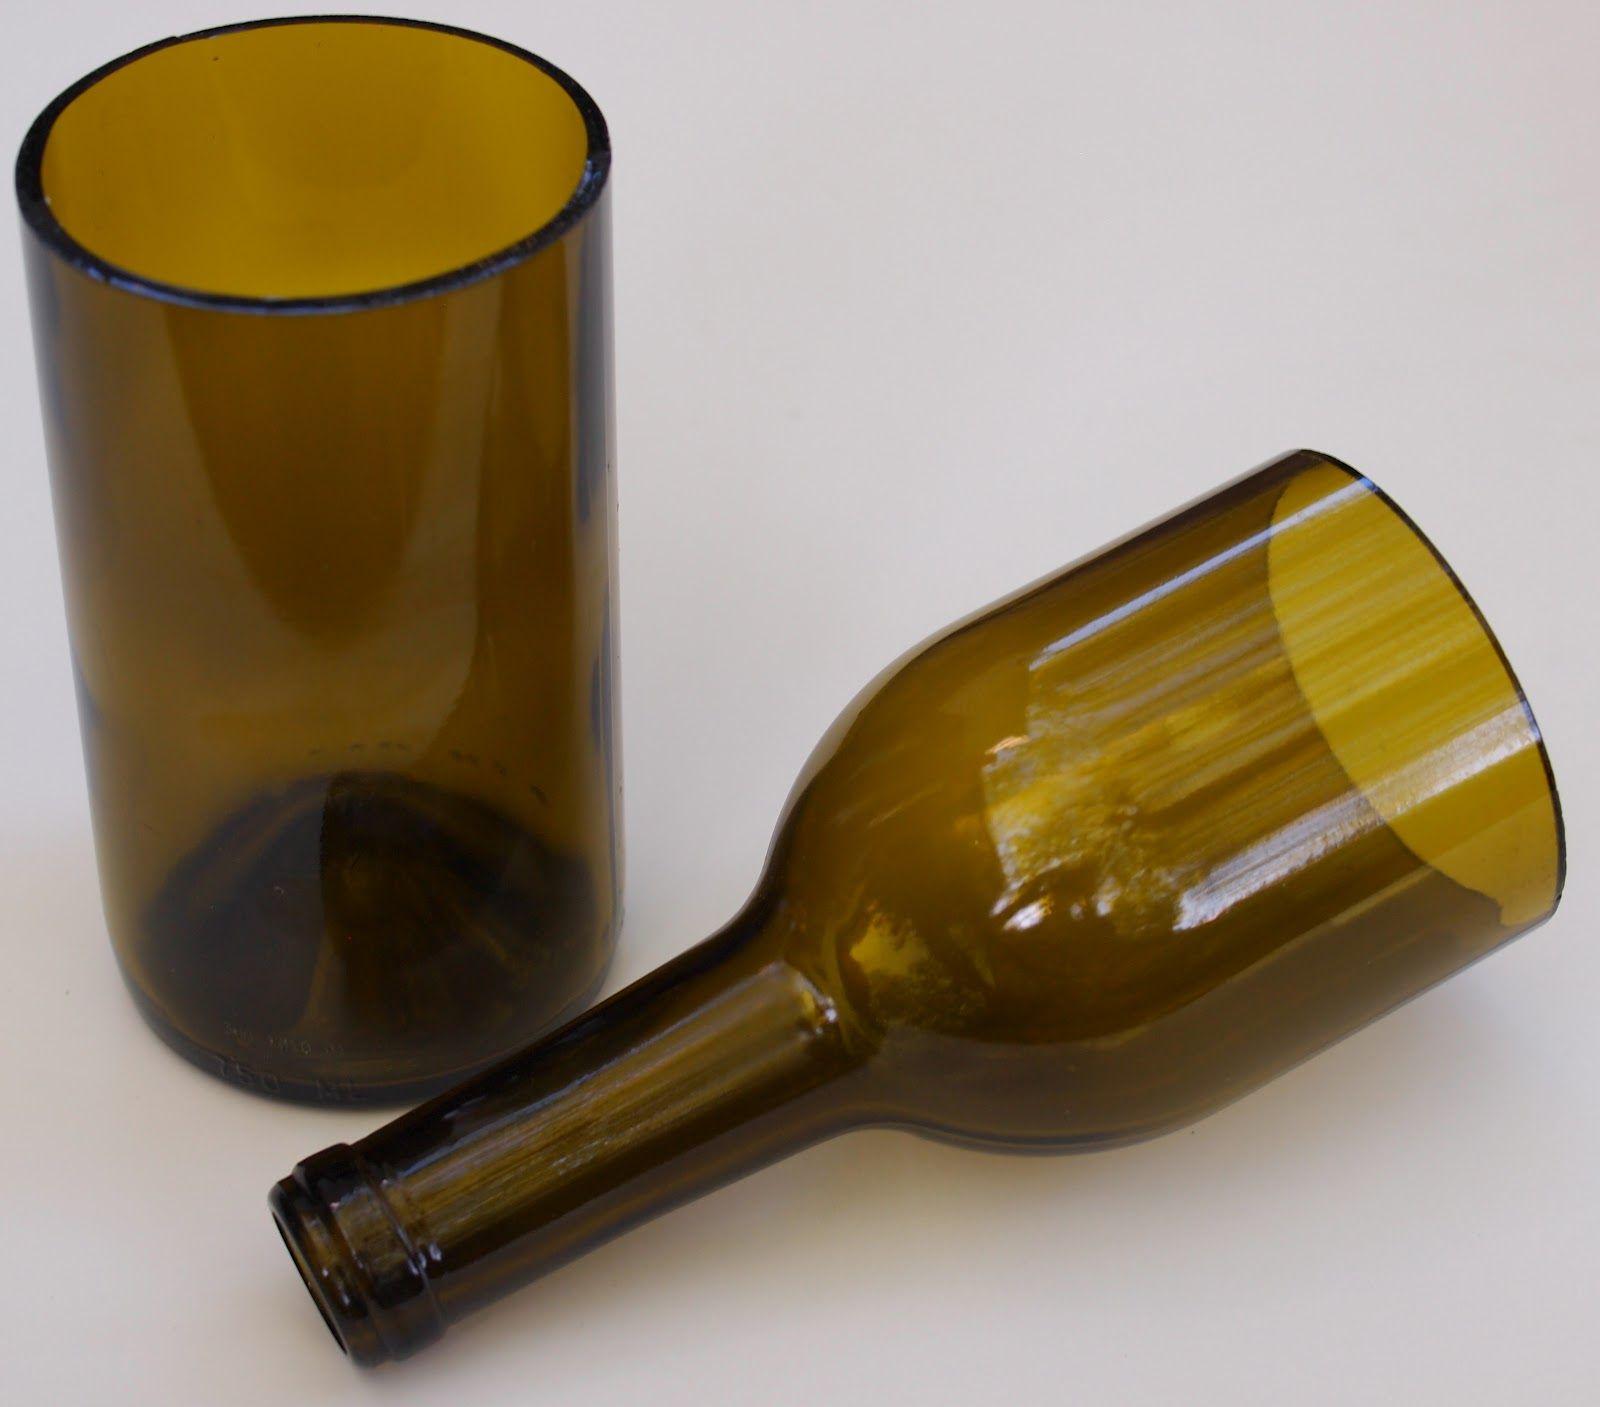 How to make wine bottle wind chimesomething